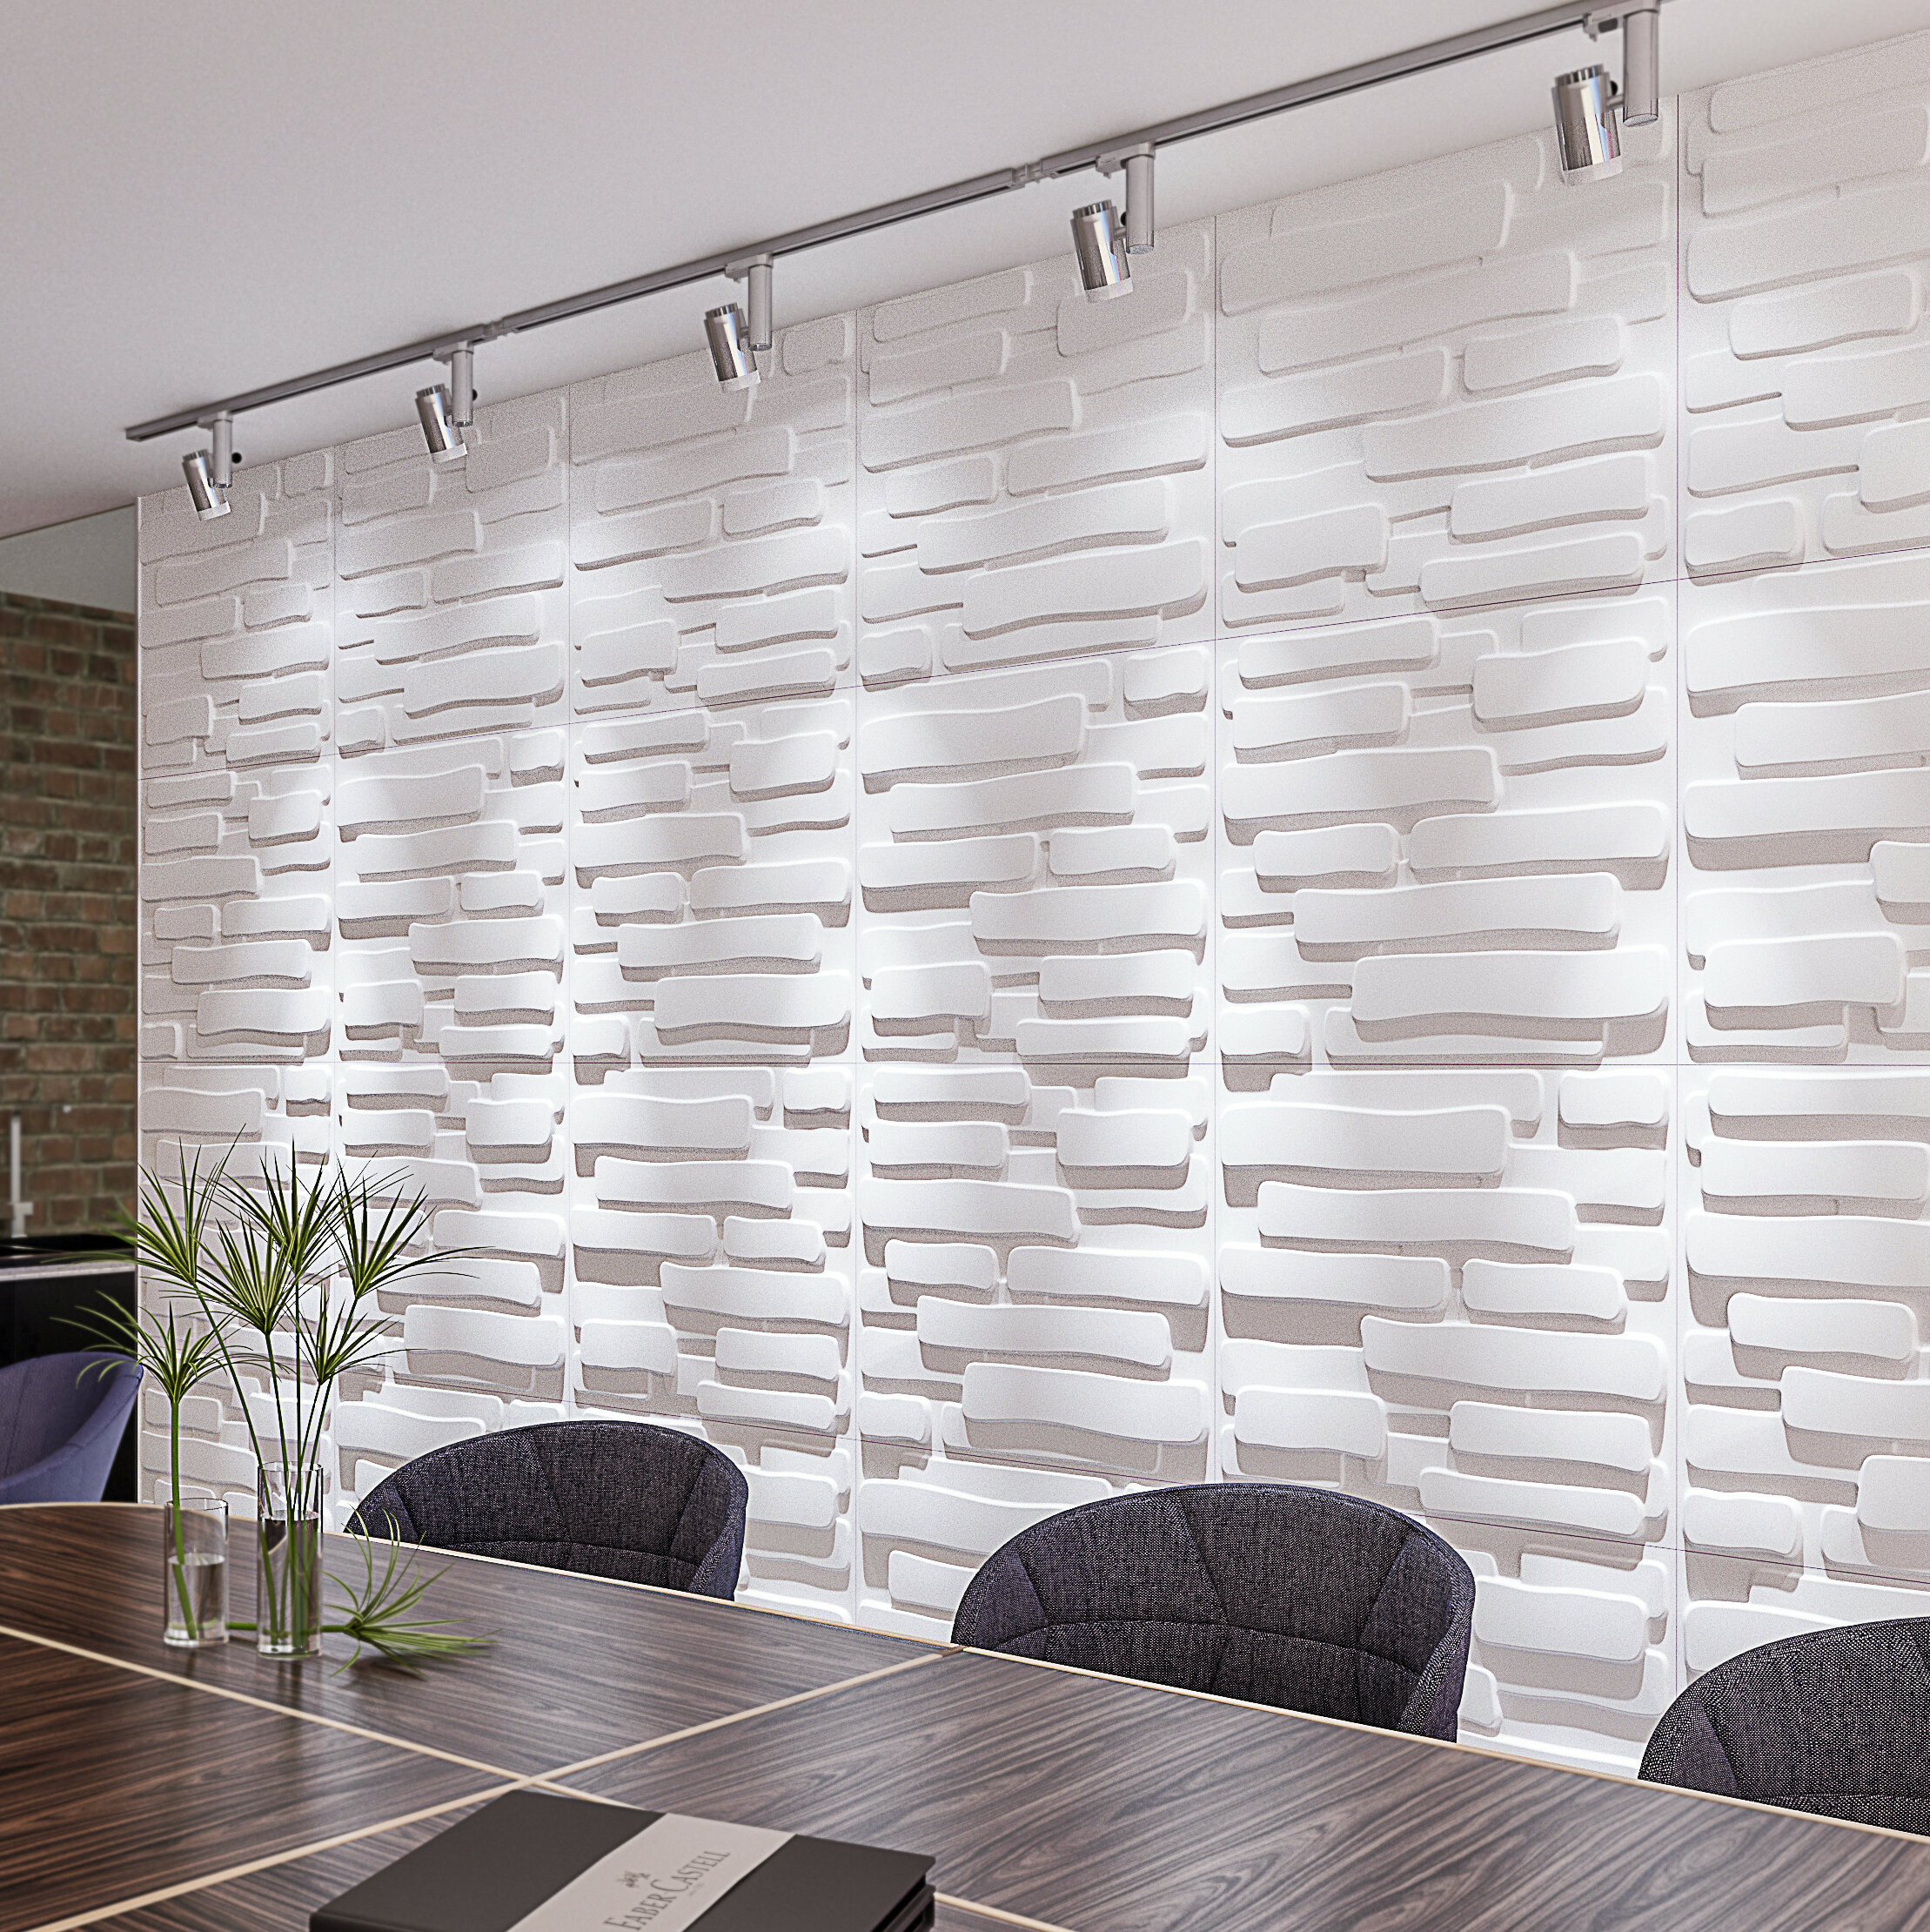 3d fibre decorative wall panelspaintable plant fibre designtextured eco friendly modern wall decor slab